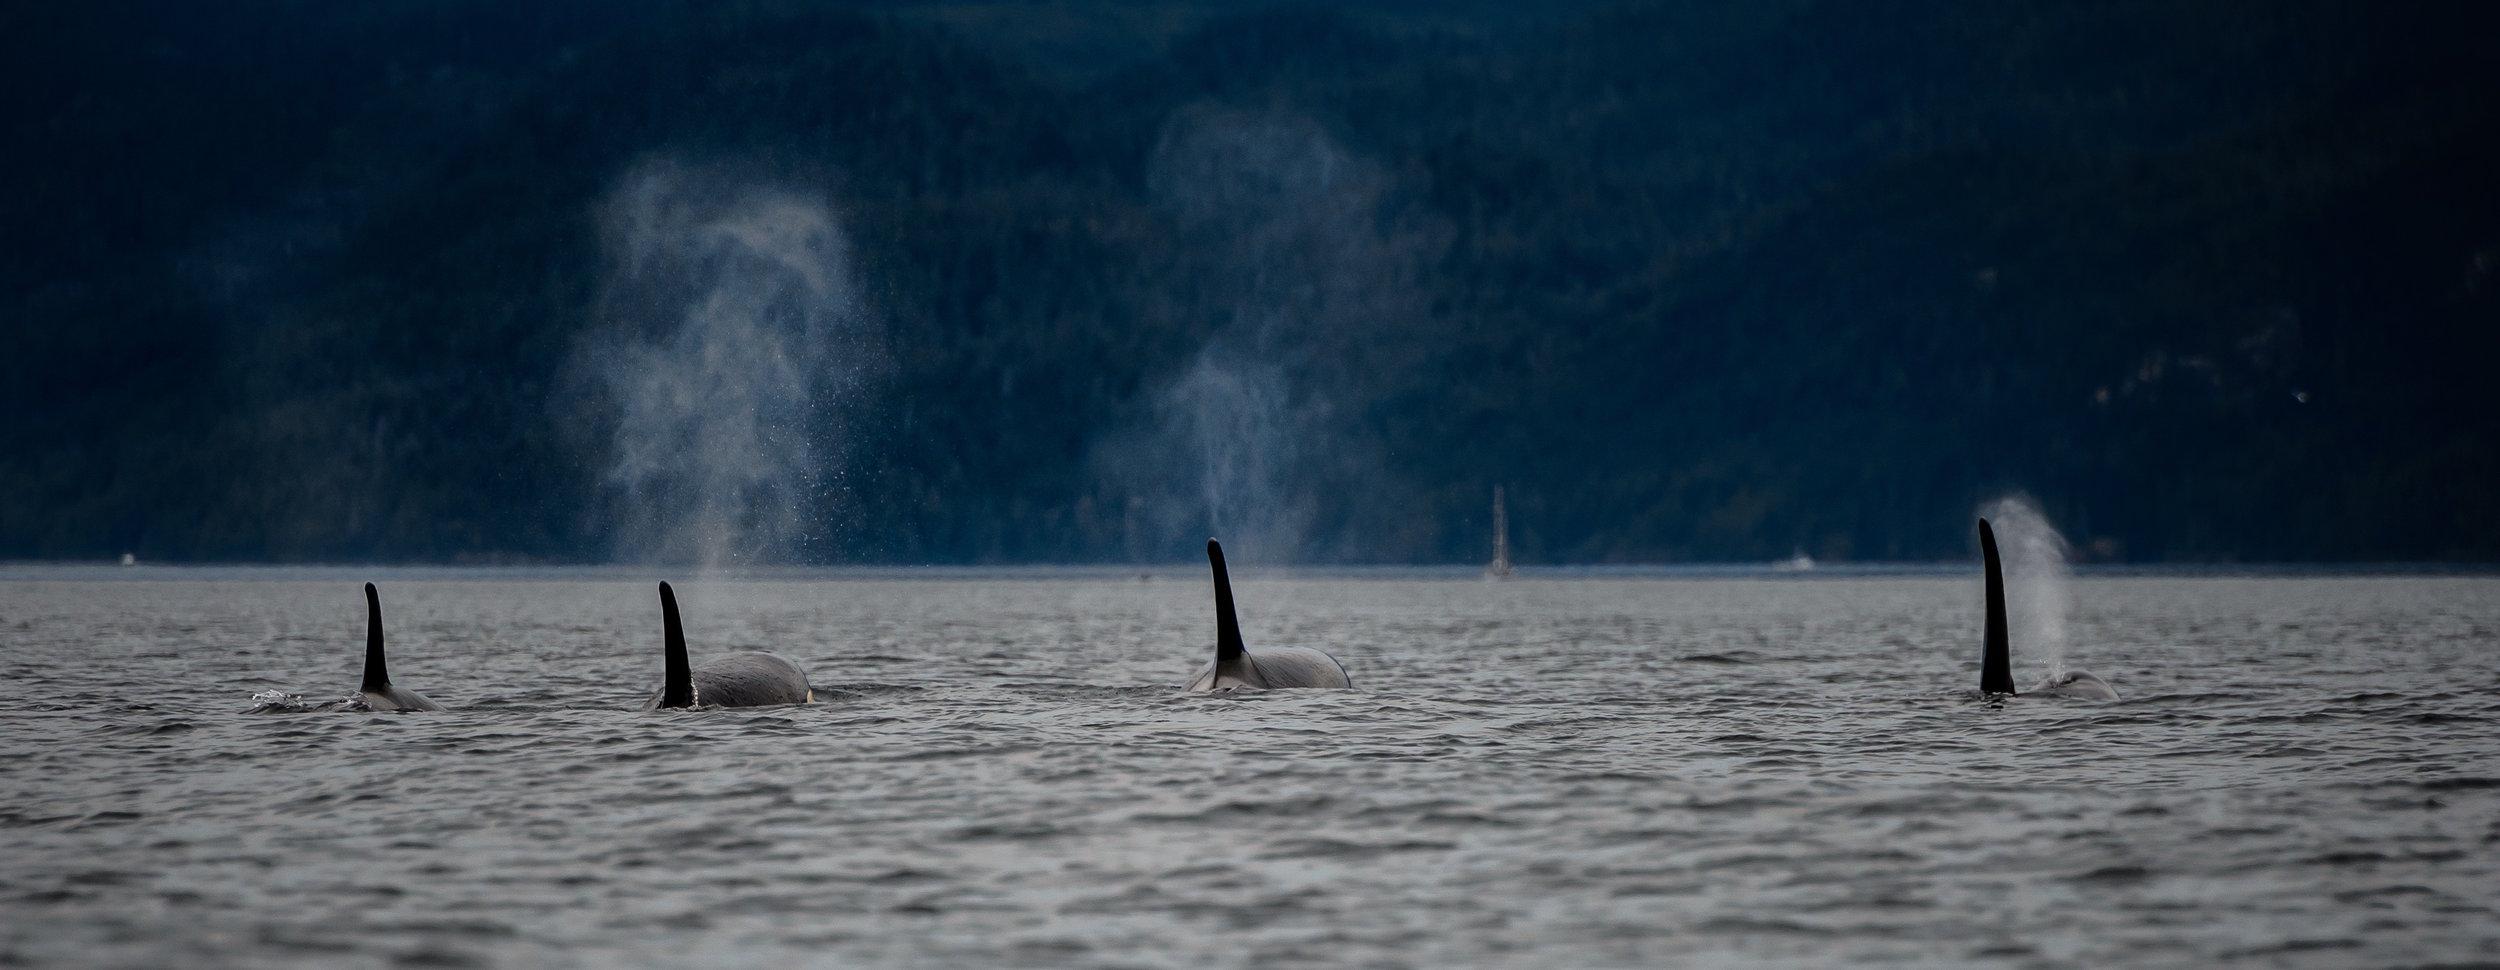 Orcas © Frank Busch / Unsplash.com